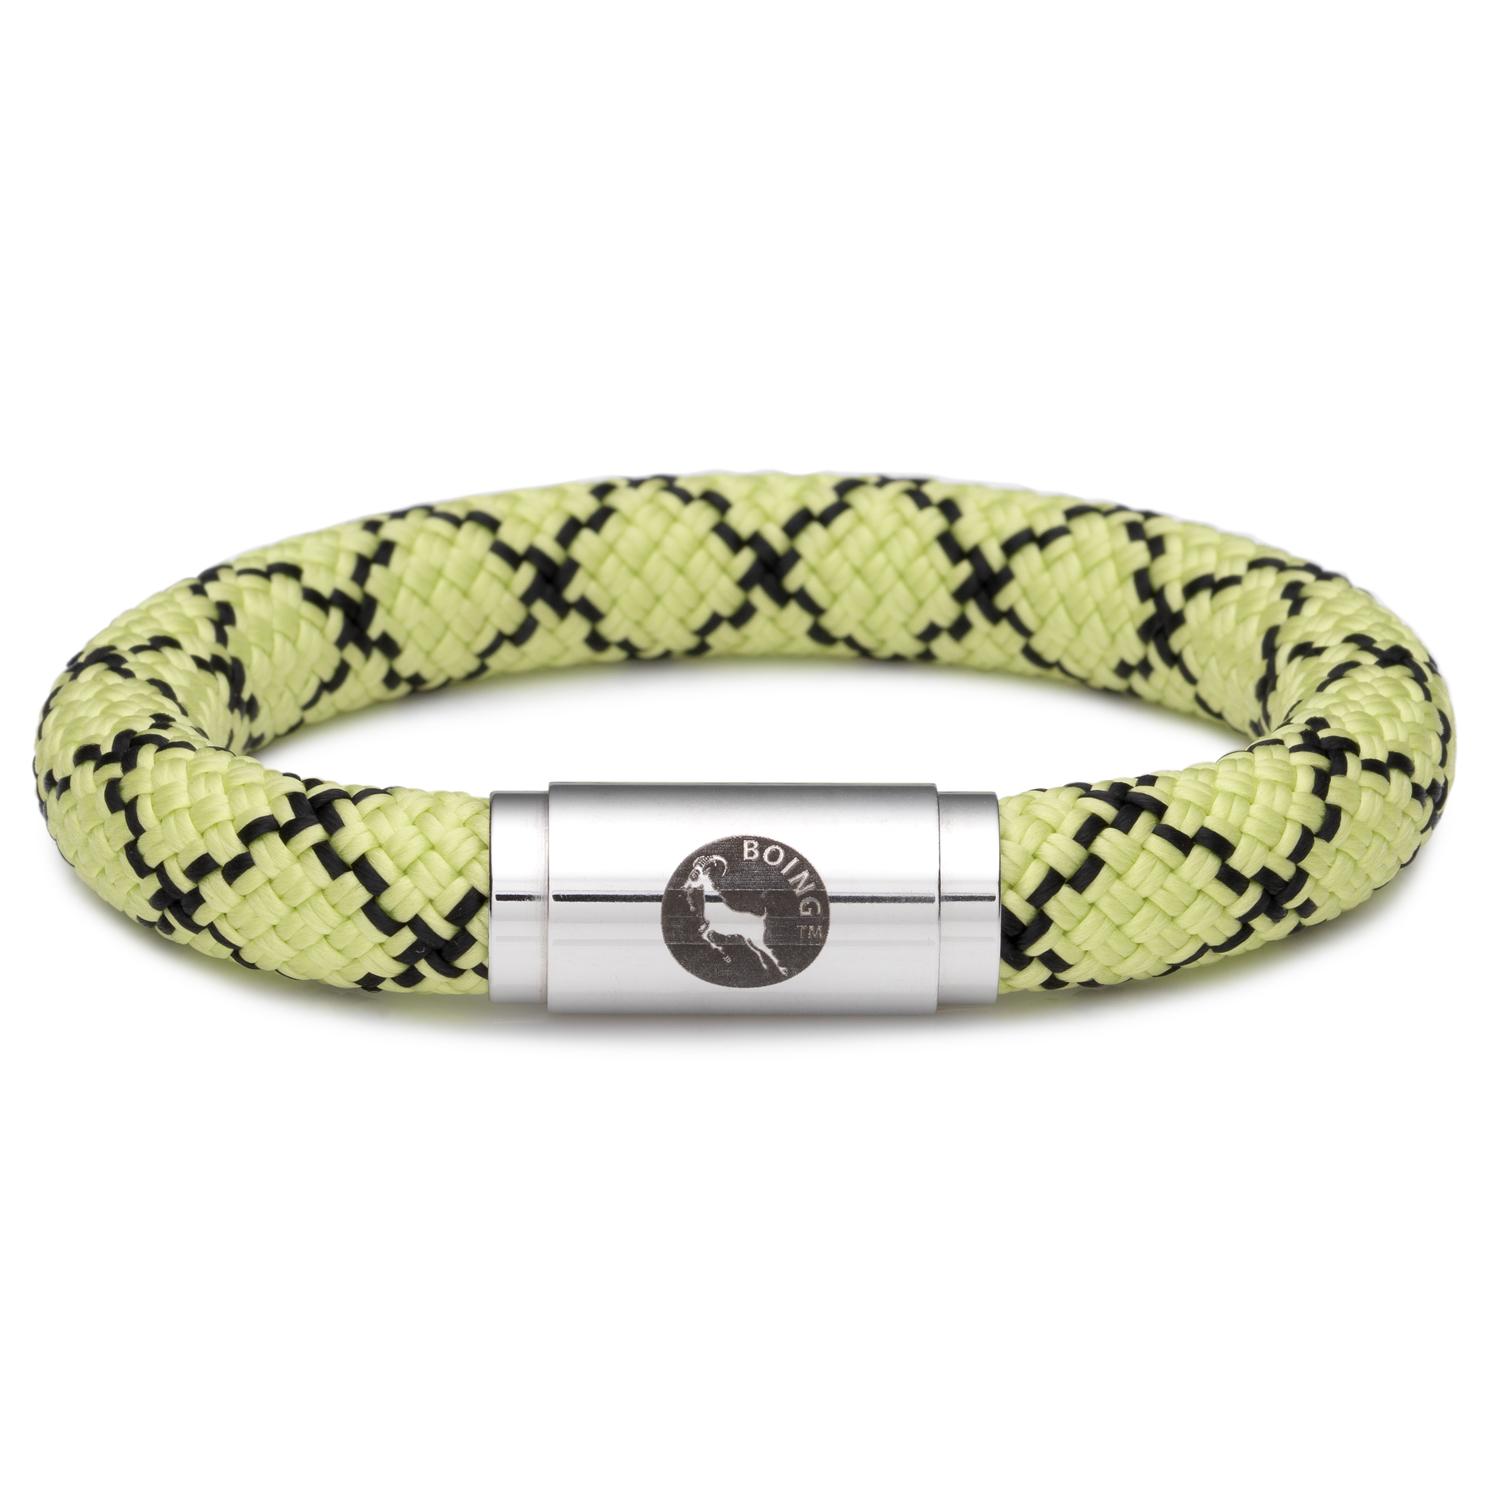 Boing – Chunky XLarge Wristband in Masai Green